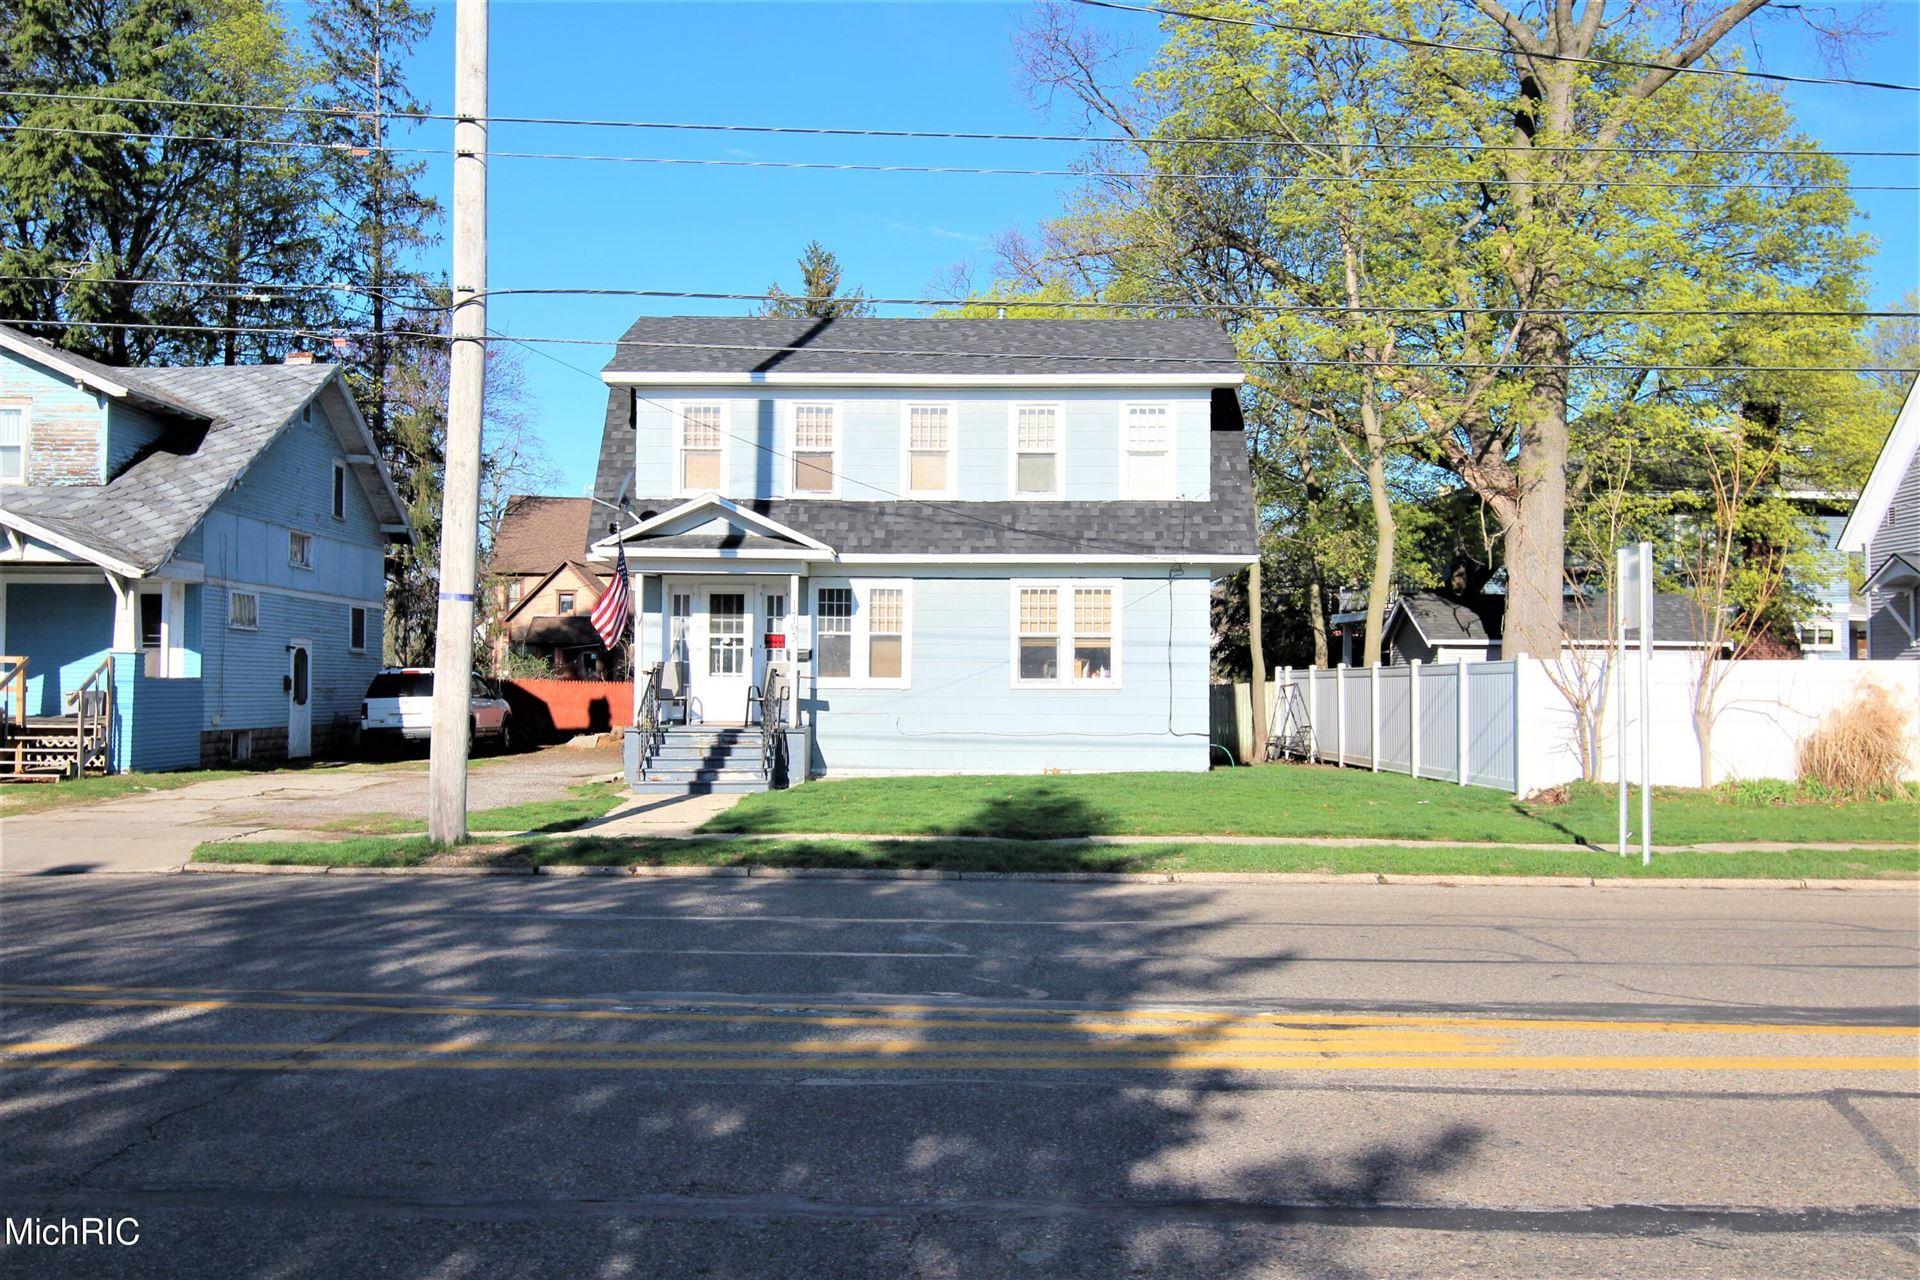 Photo of 1763 Sanford Street, Muskegon, MI 49441 (MLS # 21012477)